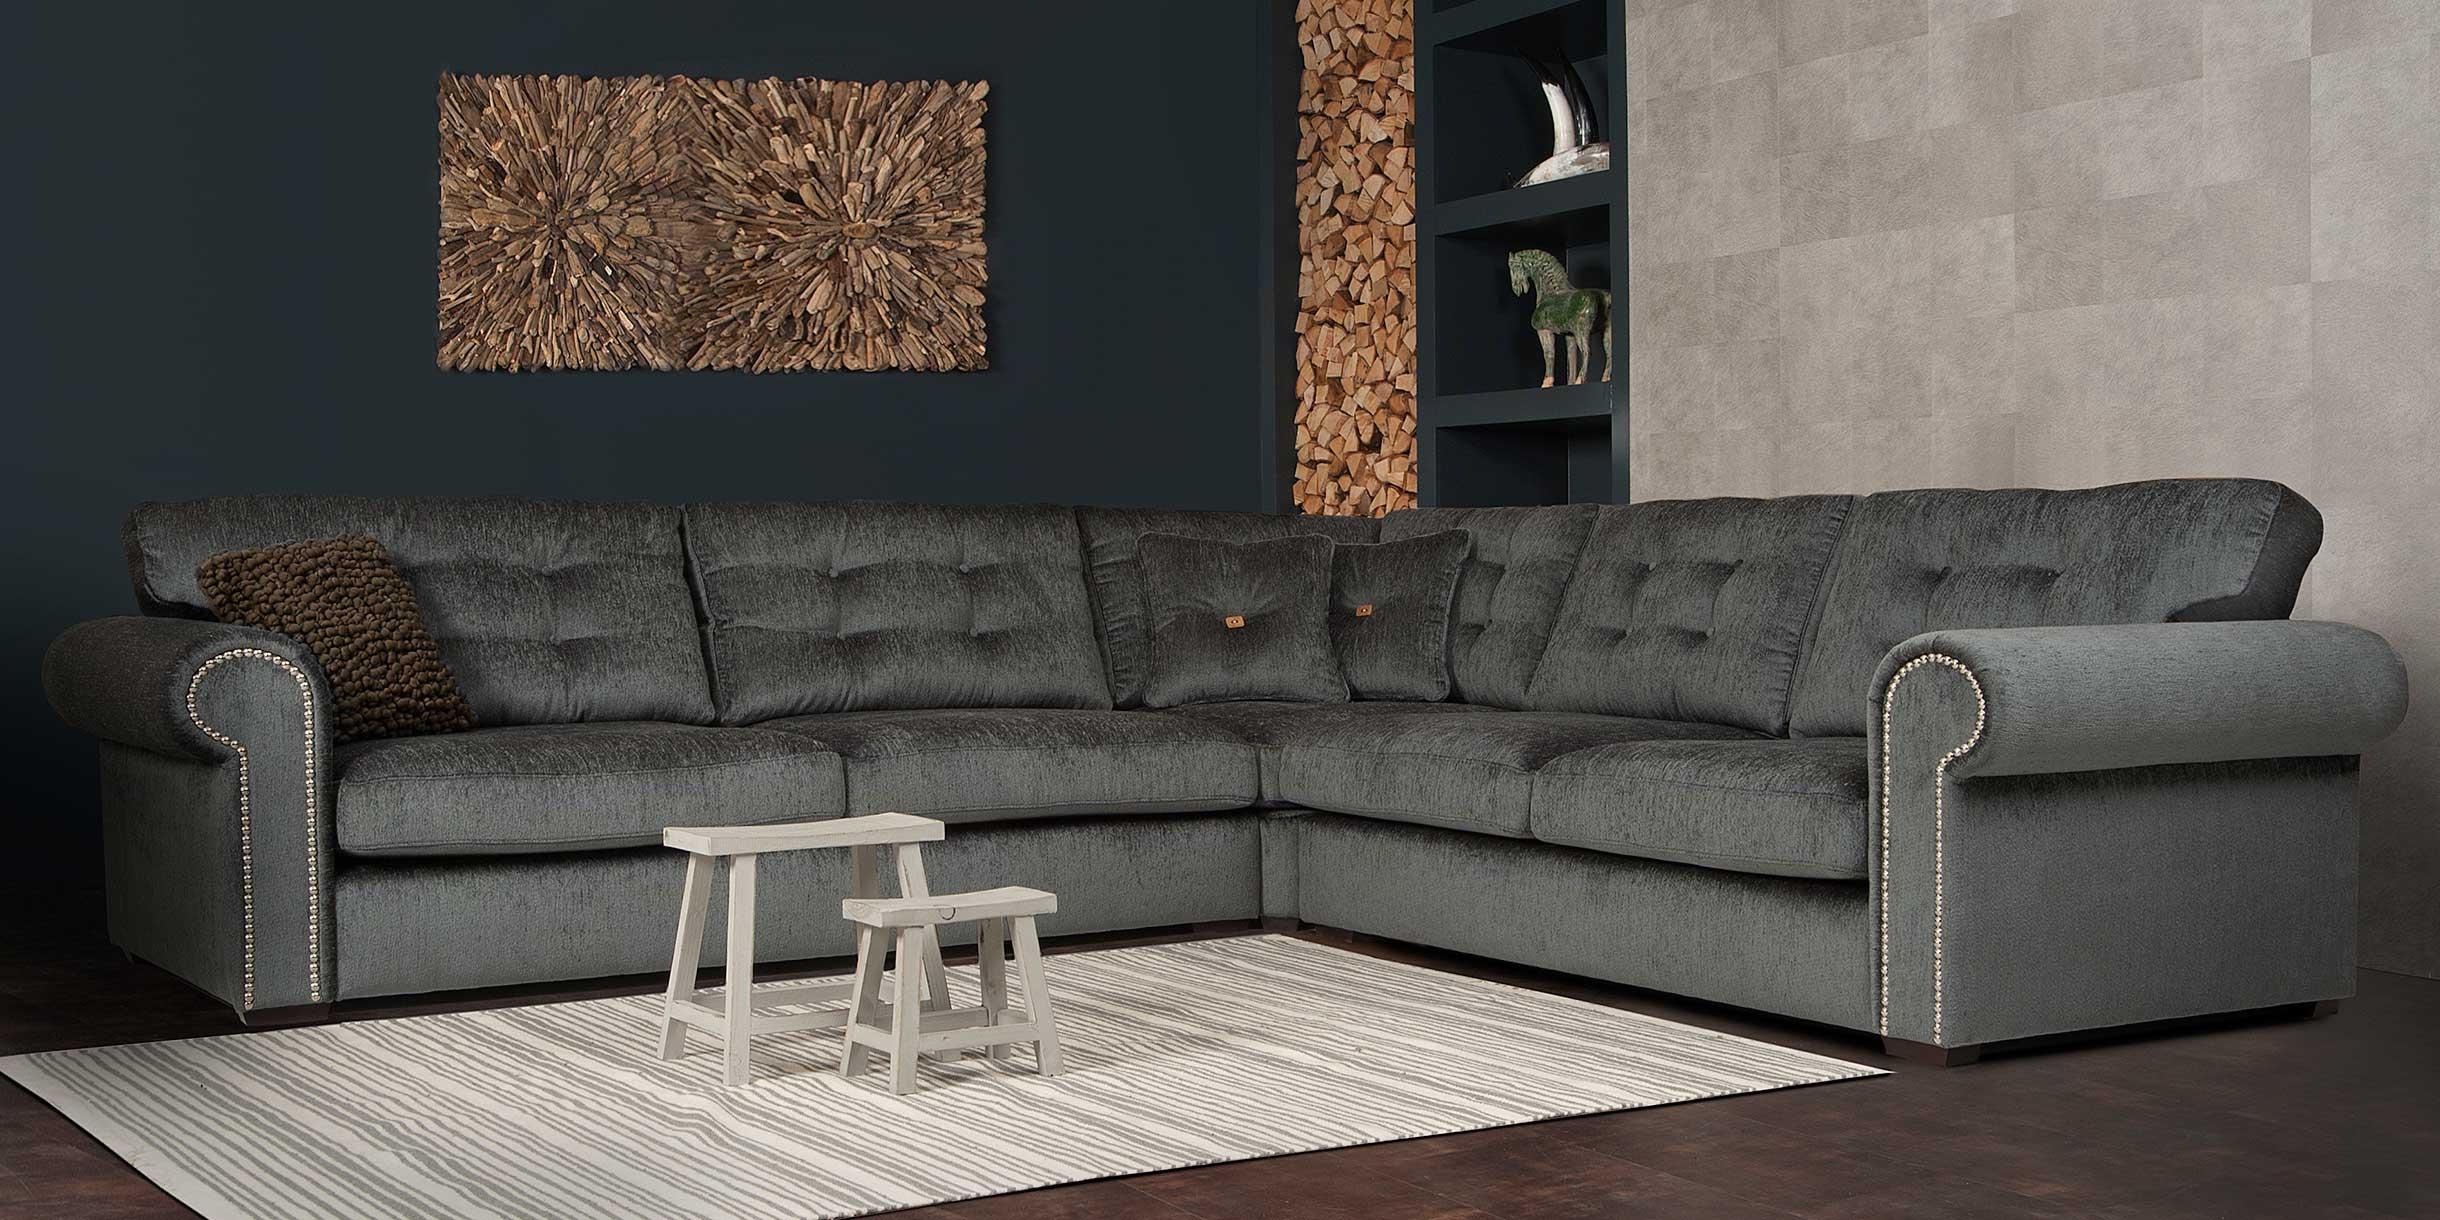 UrbanSofa-Merlin-Hoekbank-Presto-knoop-hout